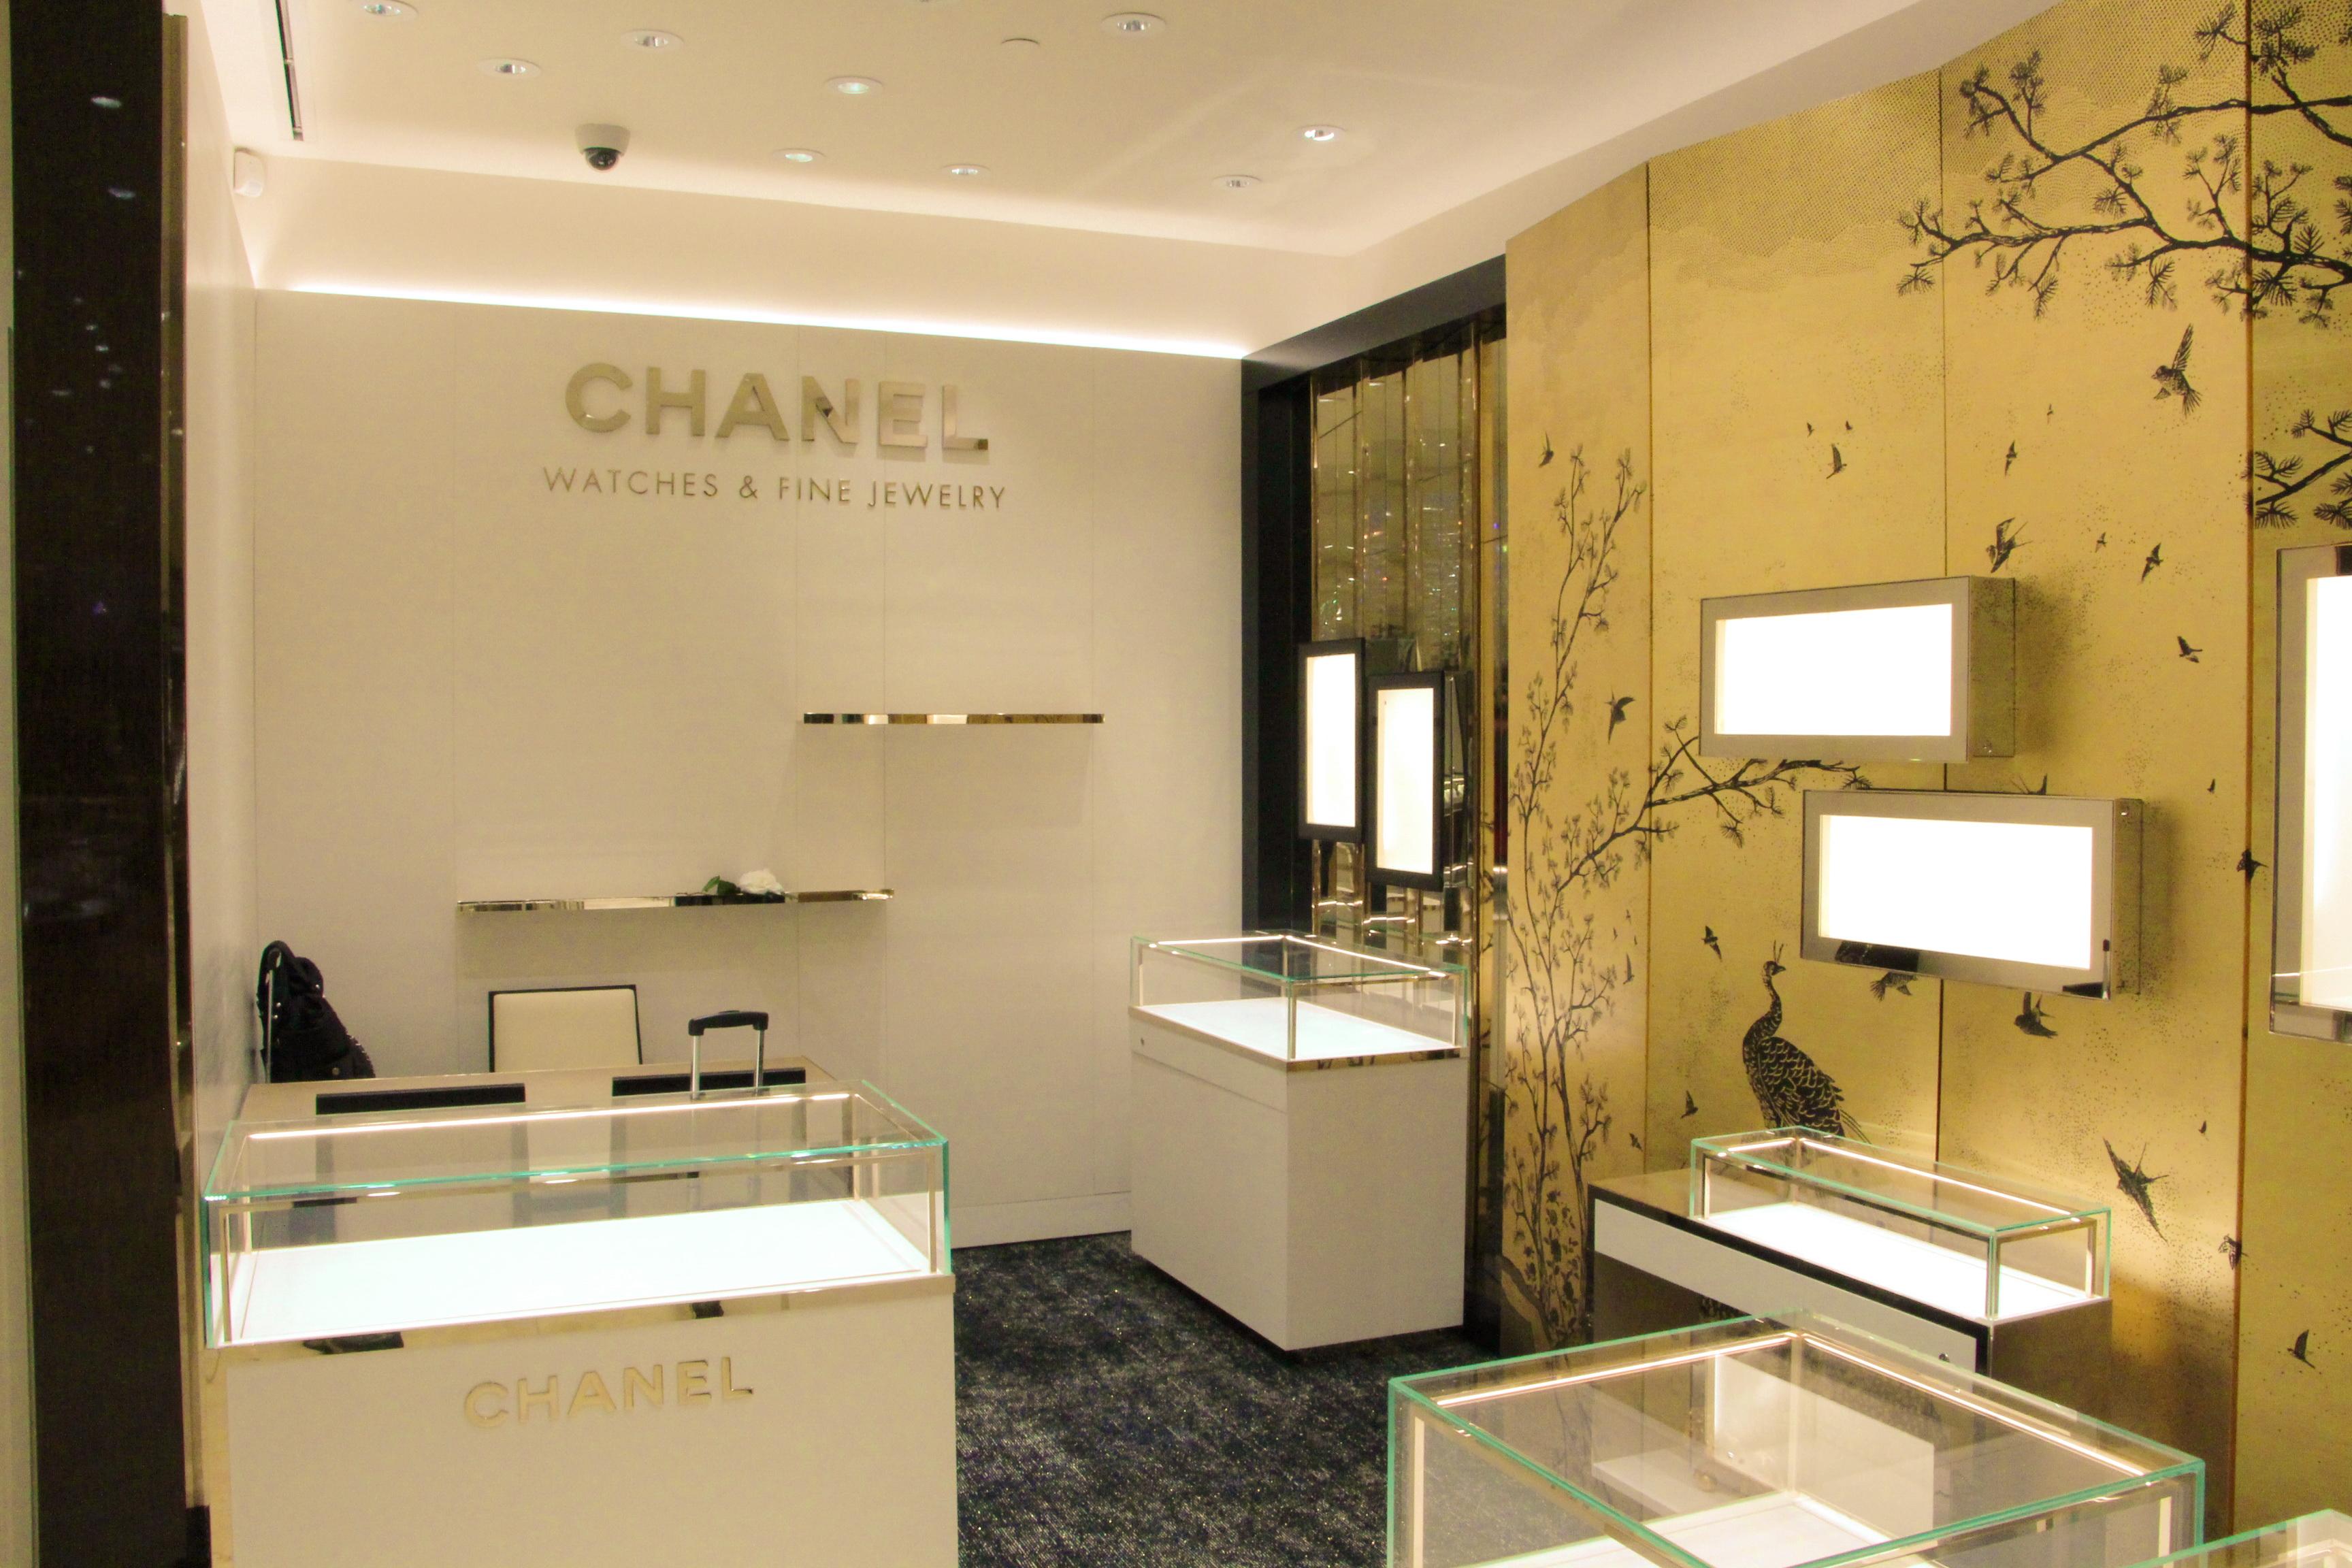 COMM_Chanel_VallyFair_3